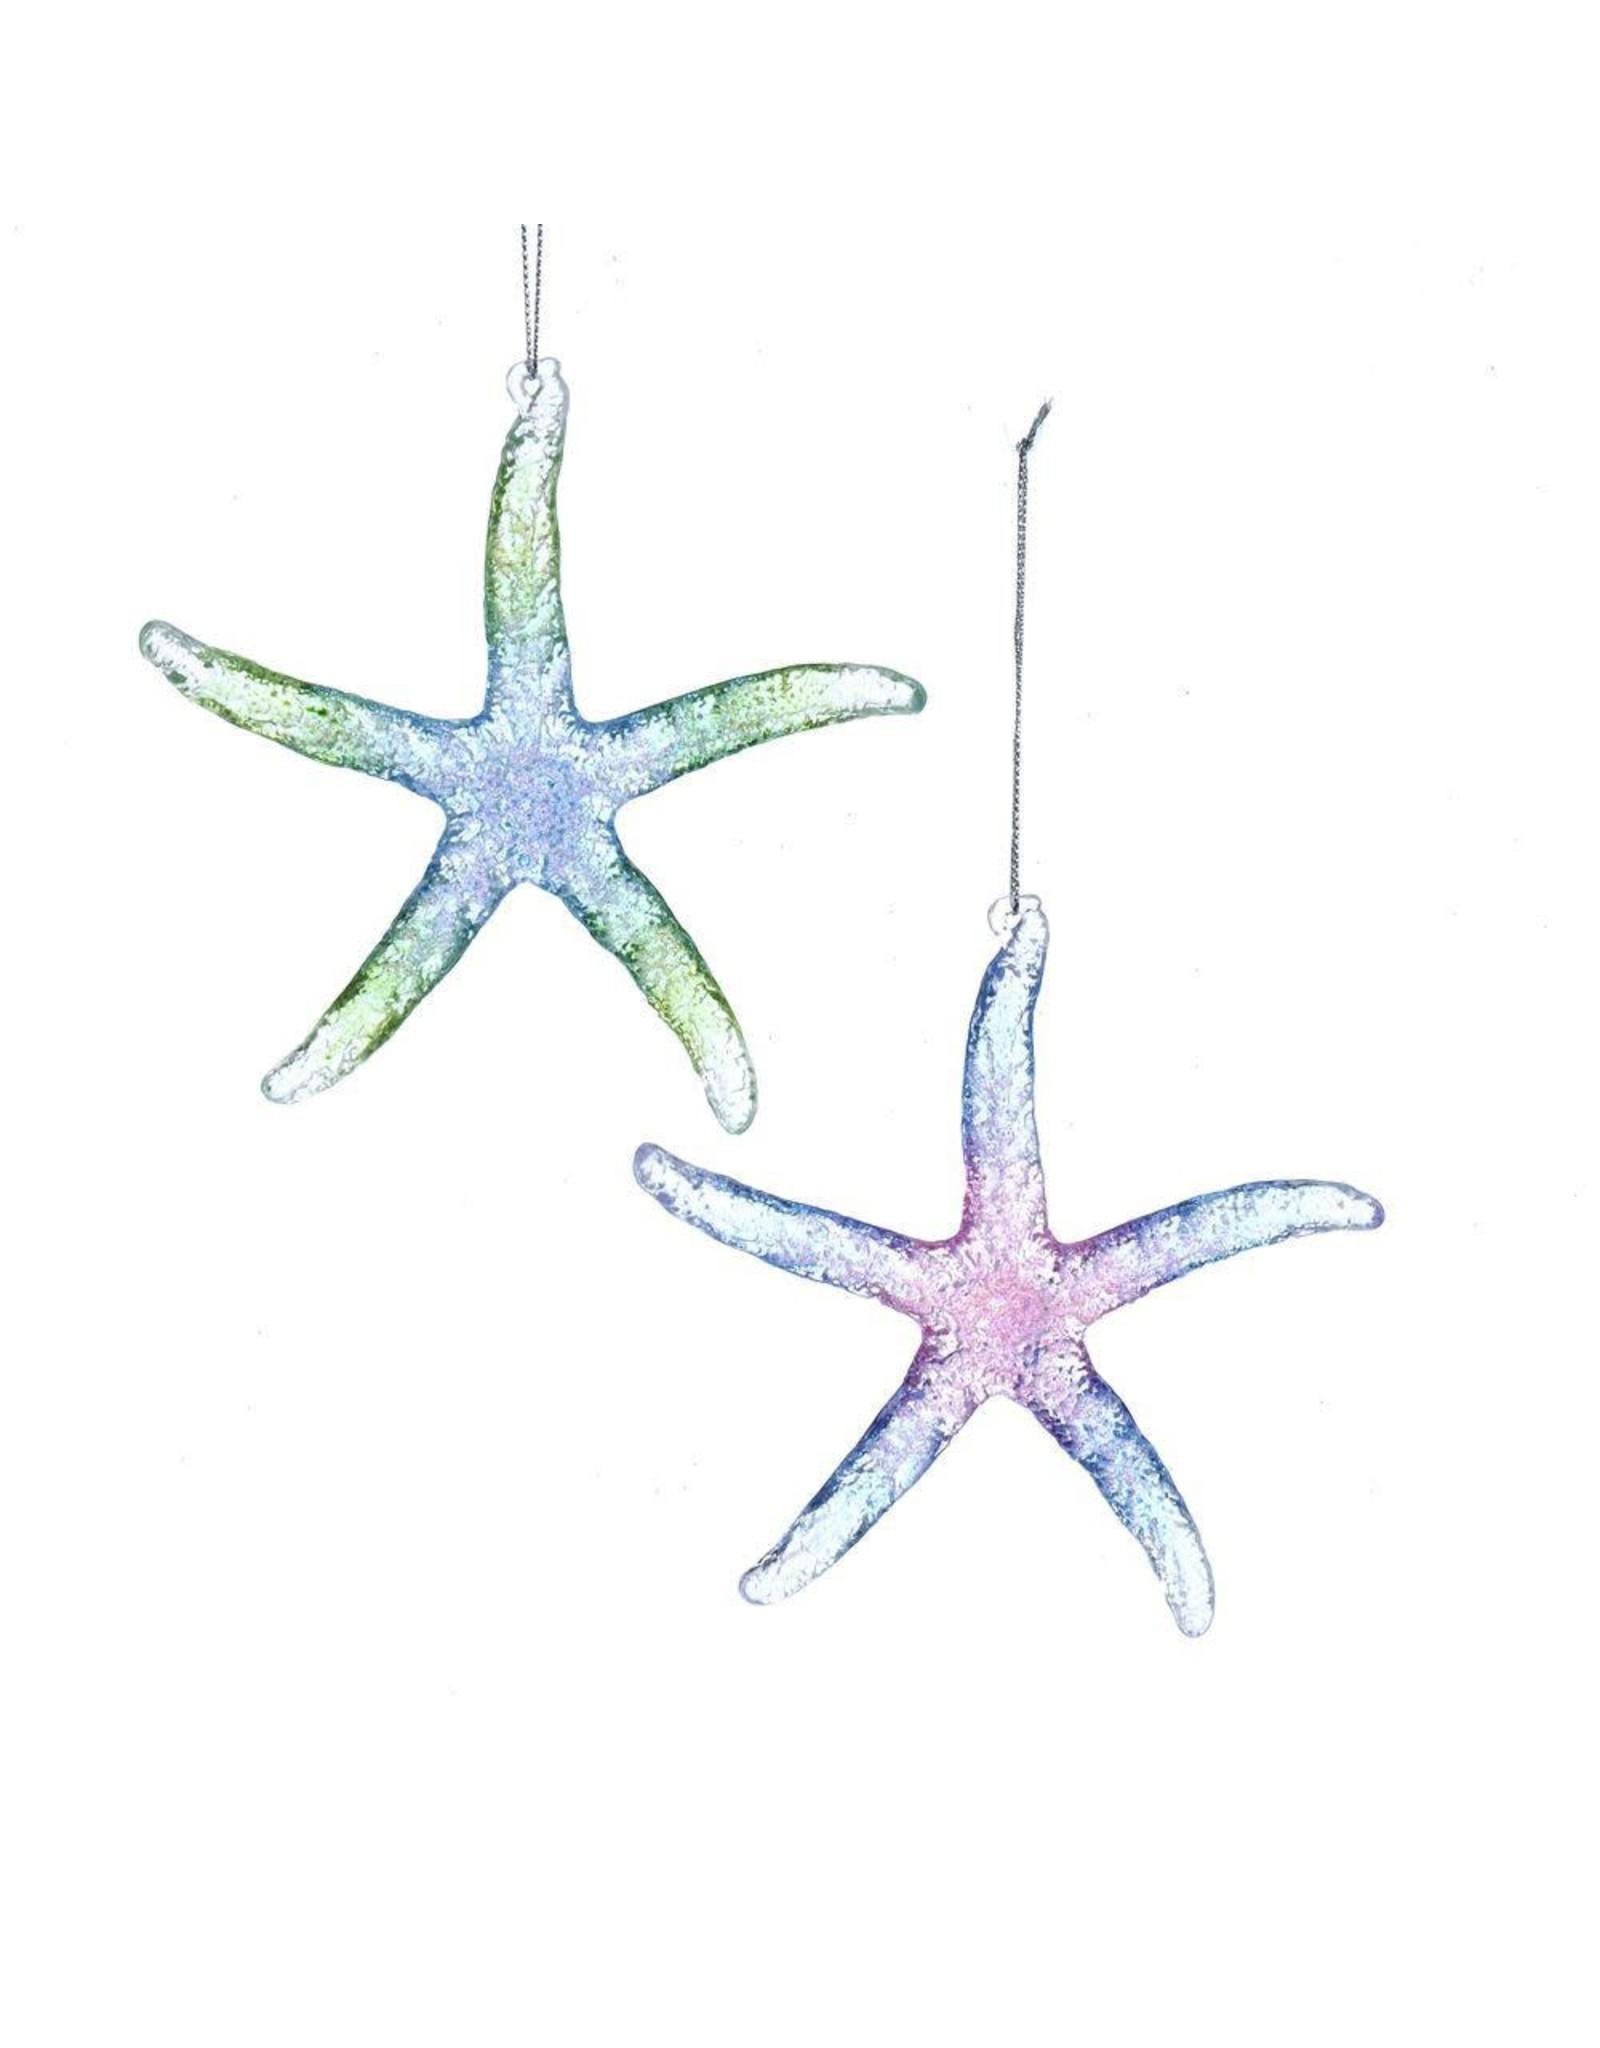 Kurt Adler Acrylic Glittered Starfish Ornaments 2 Assorted